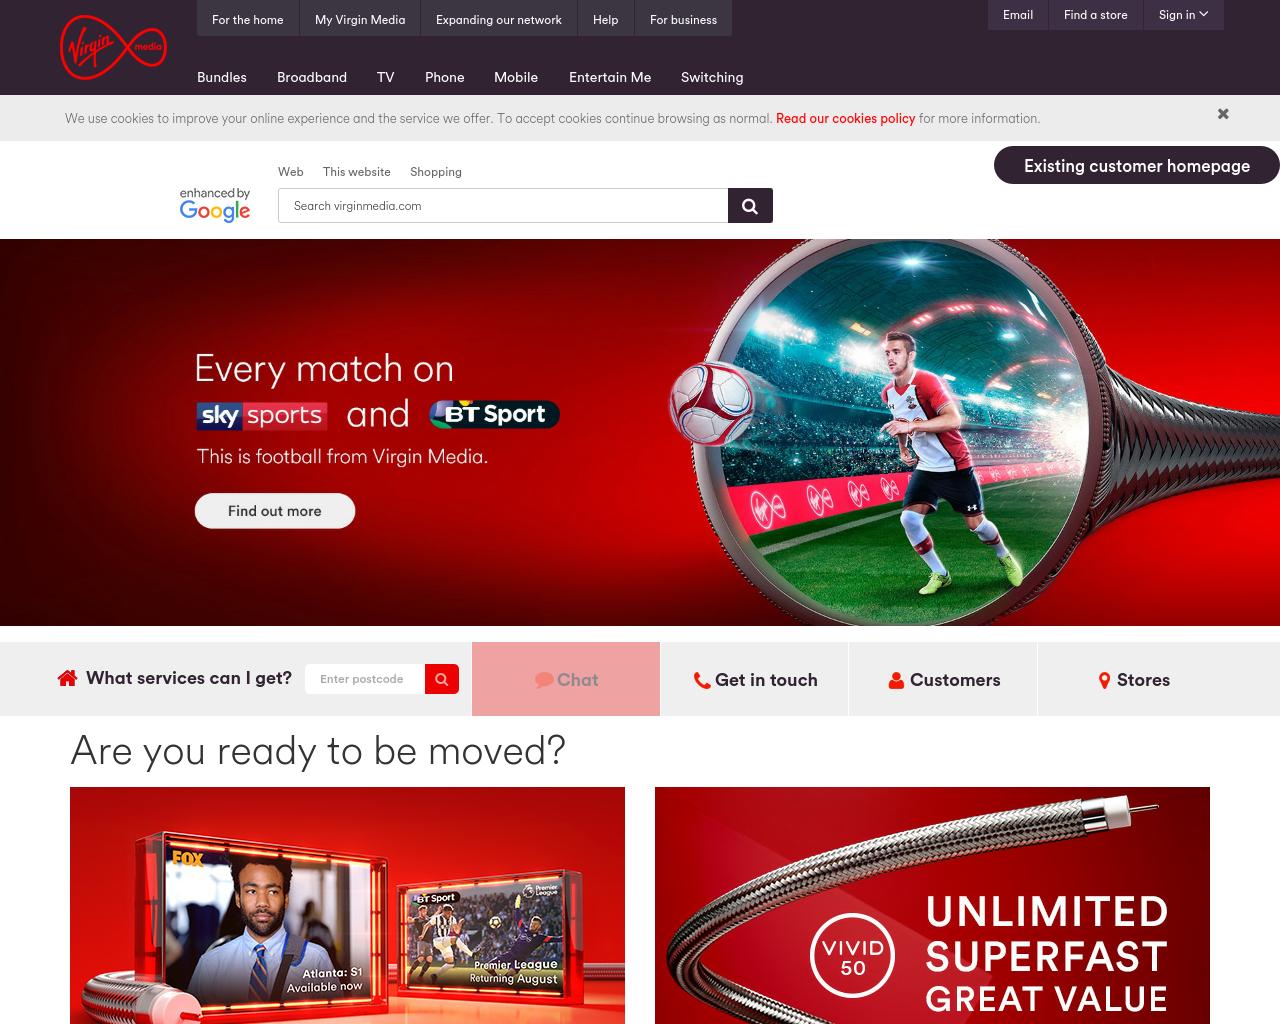 Virgin-Media-Advertising-Reviews-Pricing